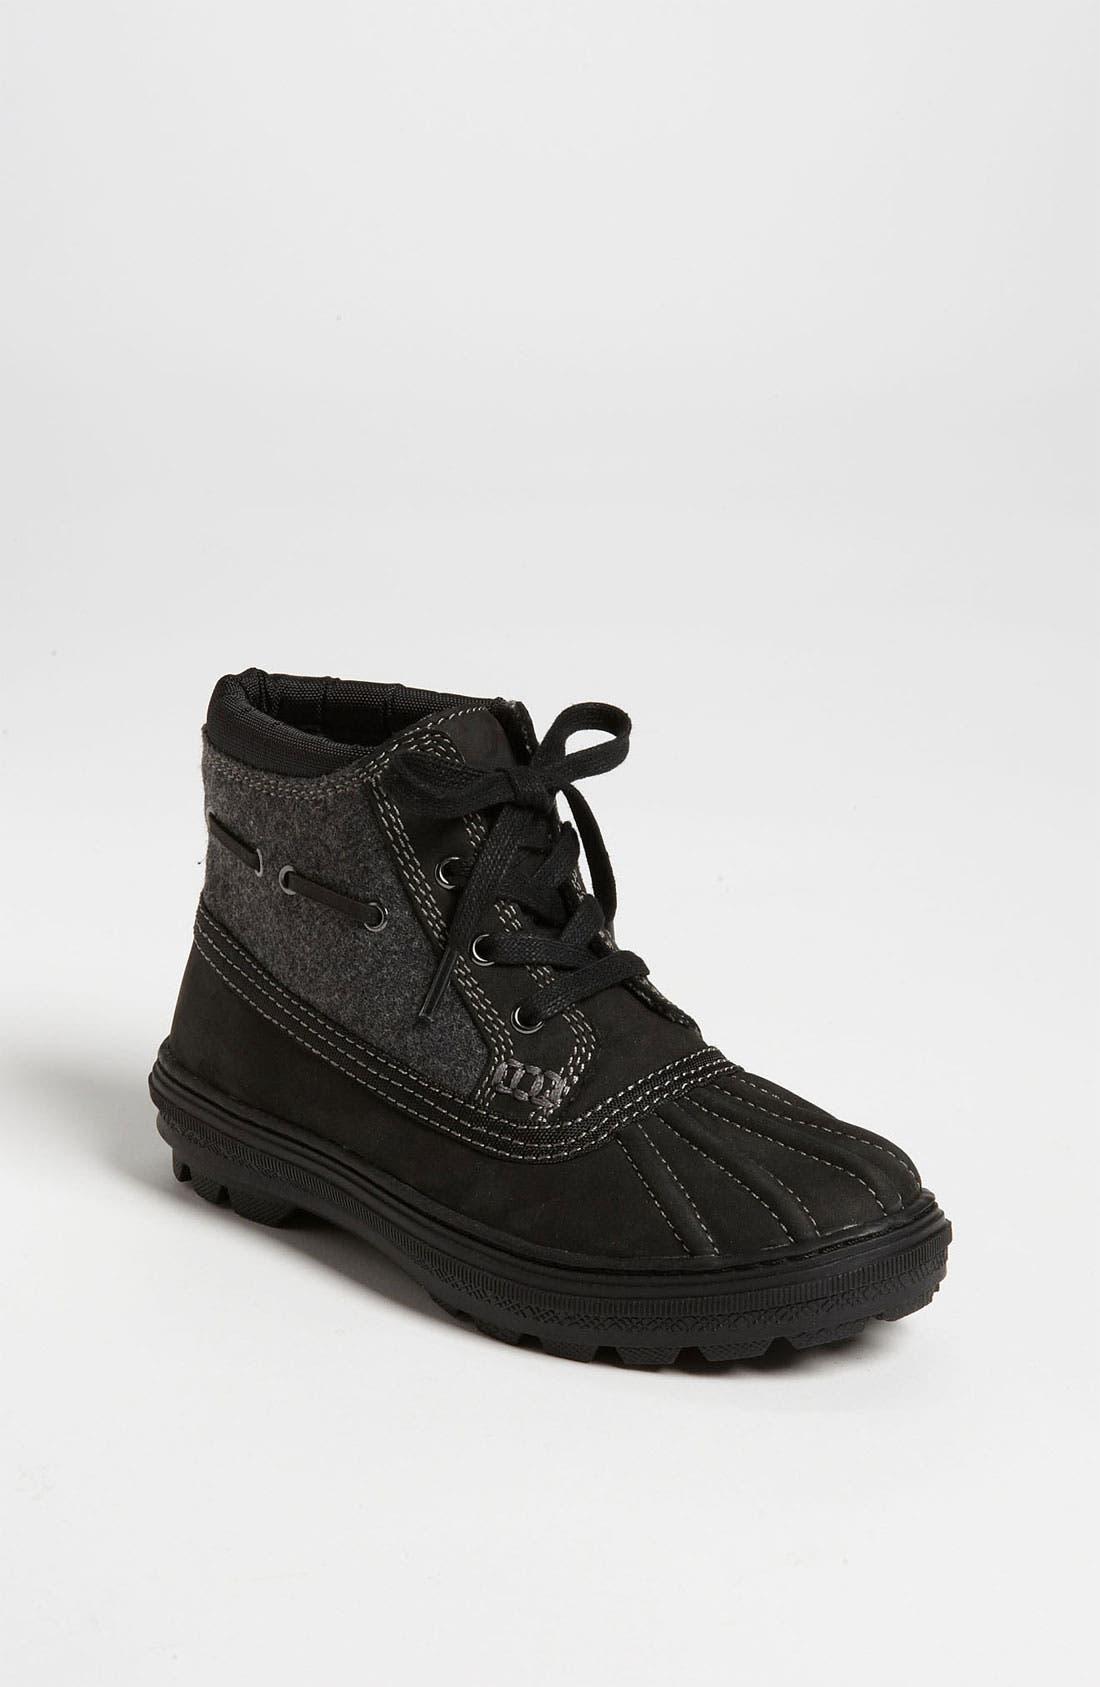 Alternate Image 1 Selected - Cole Haan 'Air Aqua' Boot (Little Kid & Big Kid)